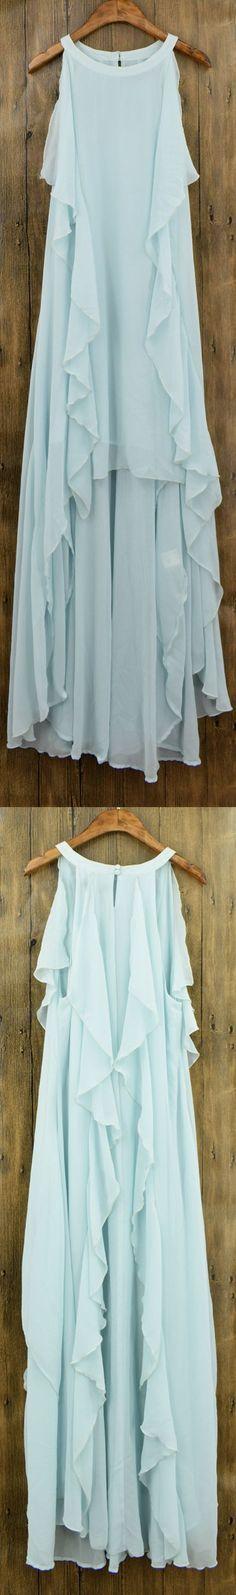 Women's Flounce Decor Sleeveless Asymmetric Chiffon Dress.Check more from www.azbro.com .